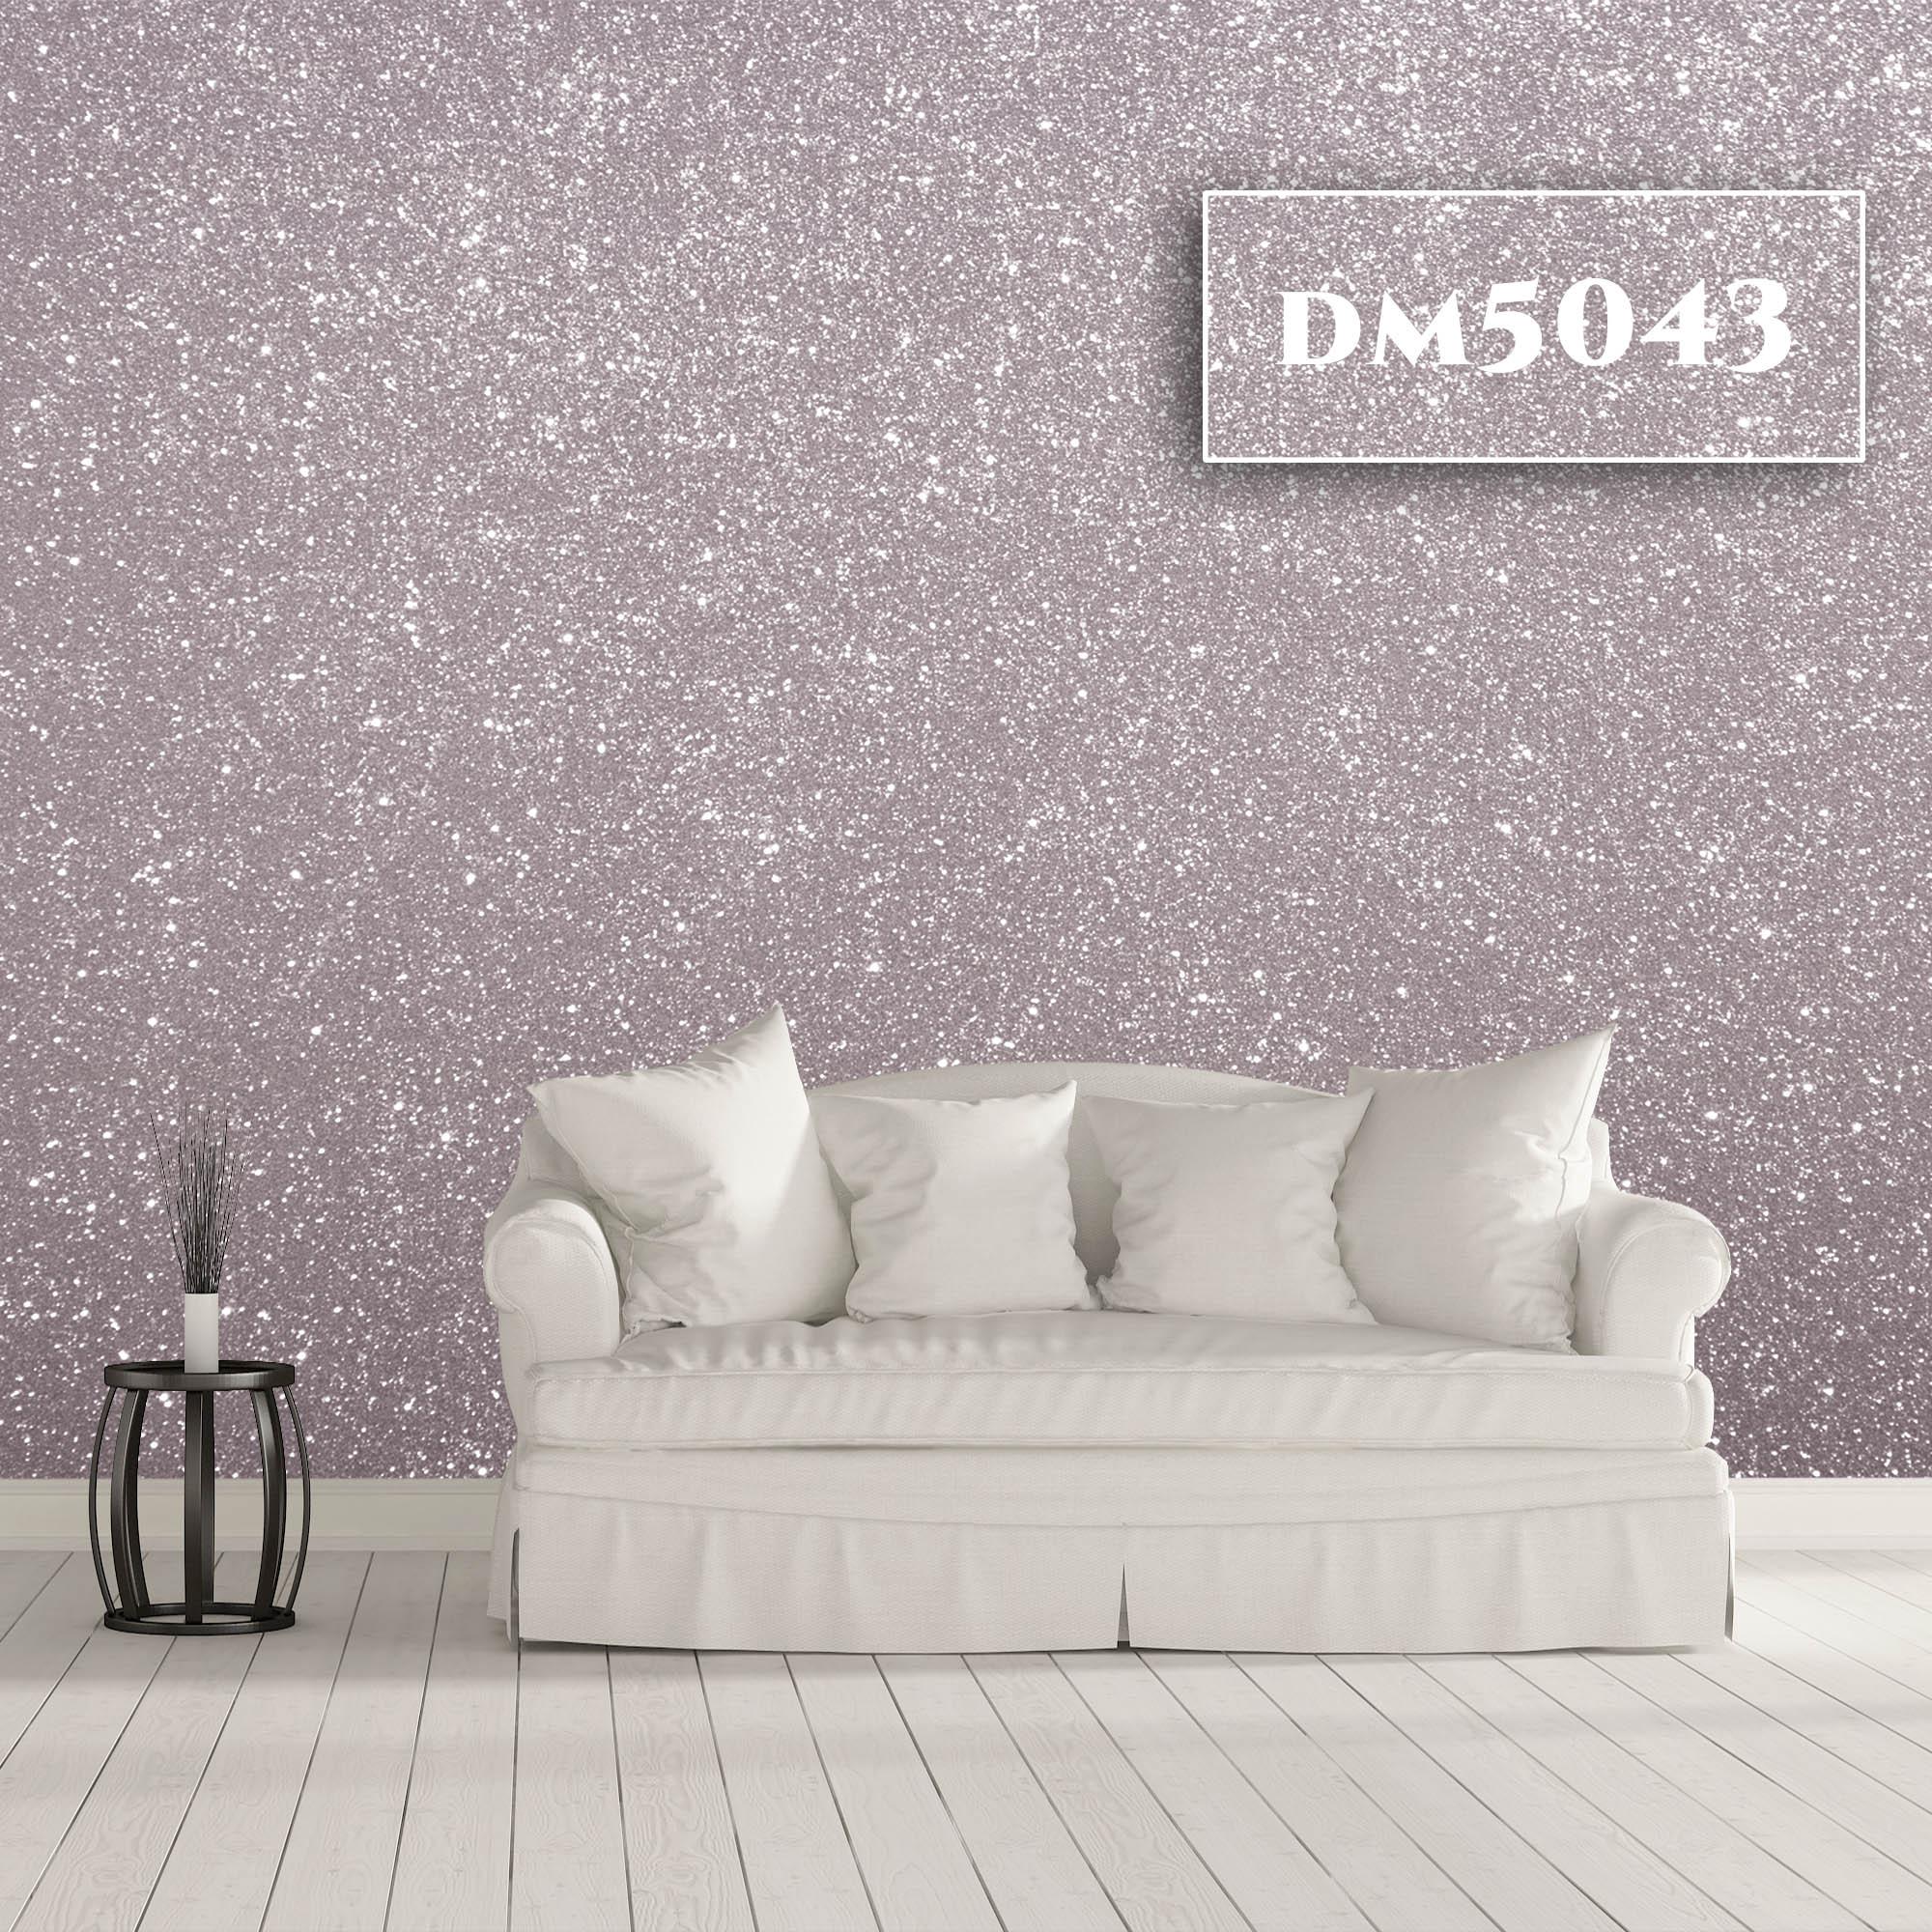 DM5043